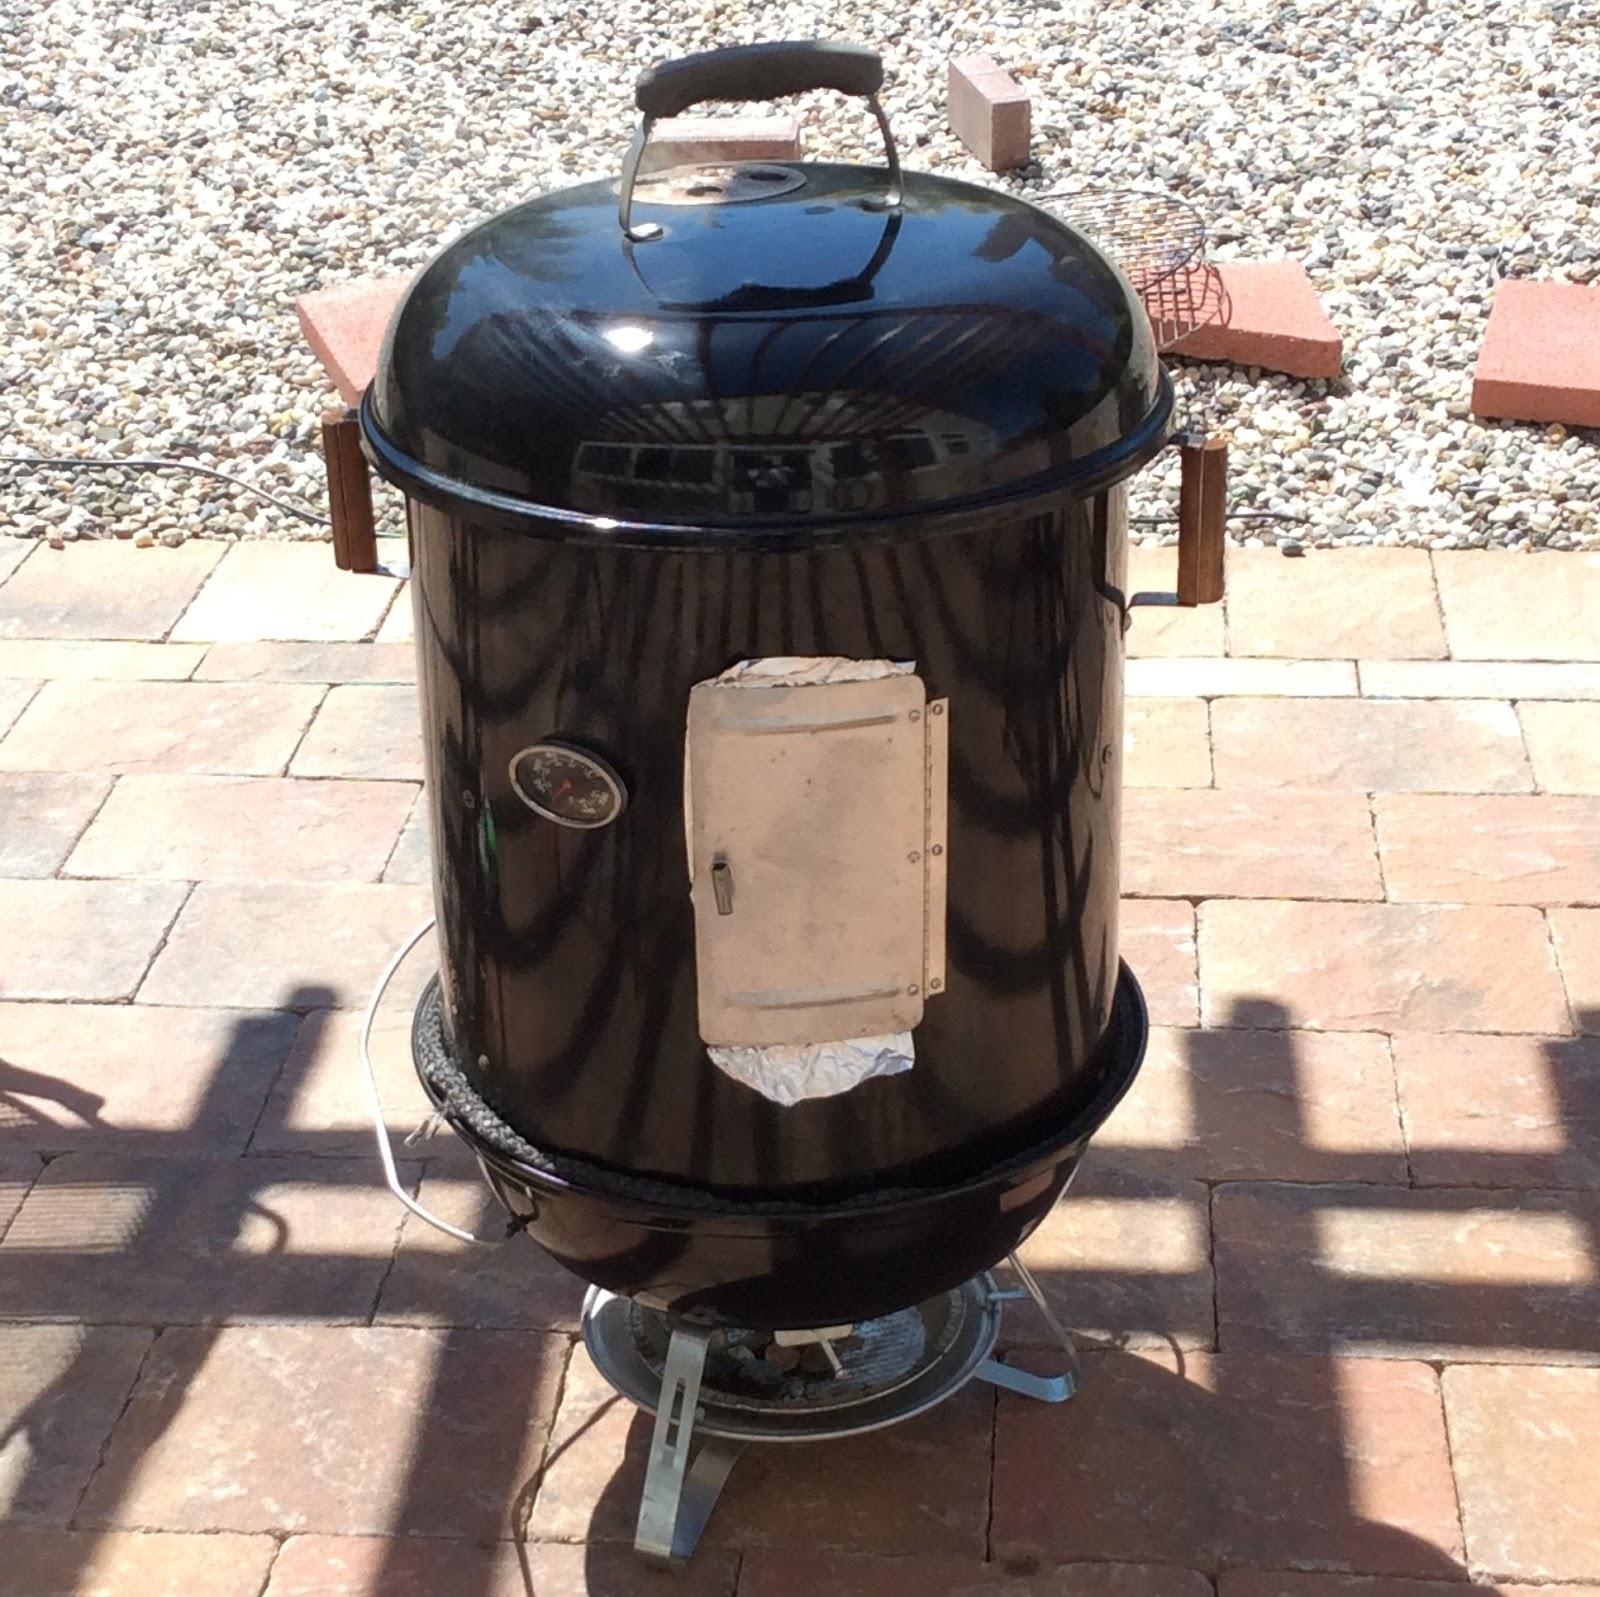 My charcoal smoker: a modded Brinkmann (ECB) and Weber Jumbo Joe hybrid